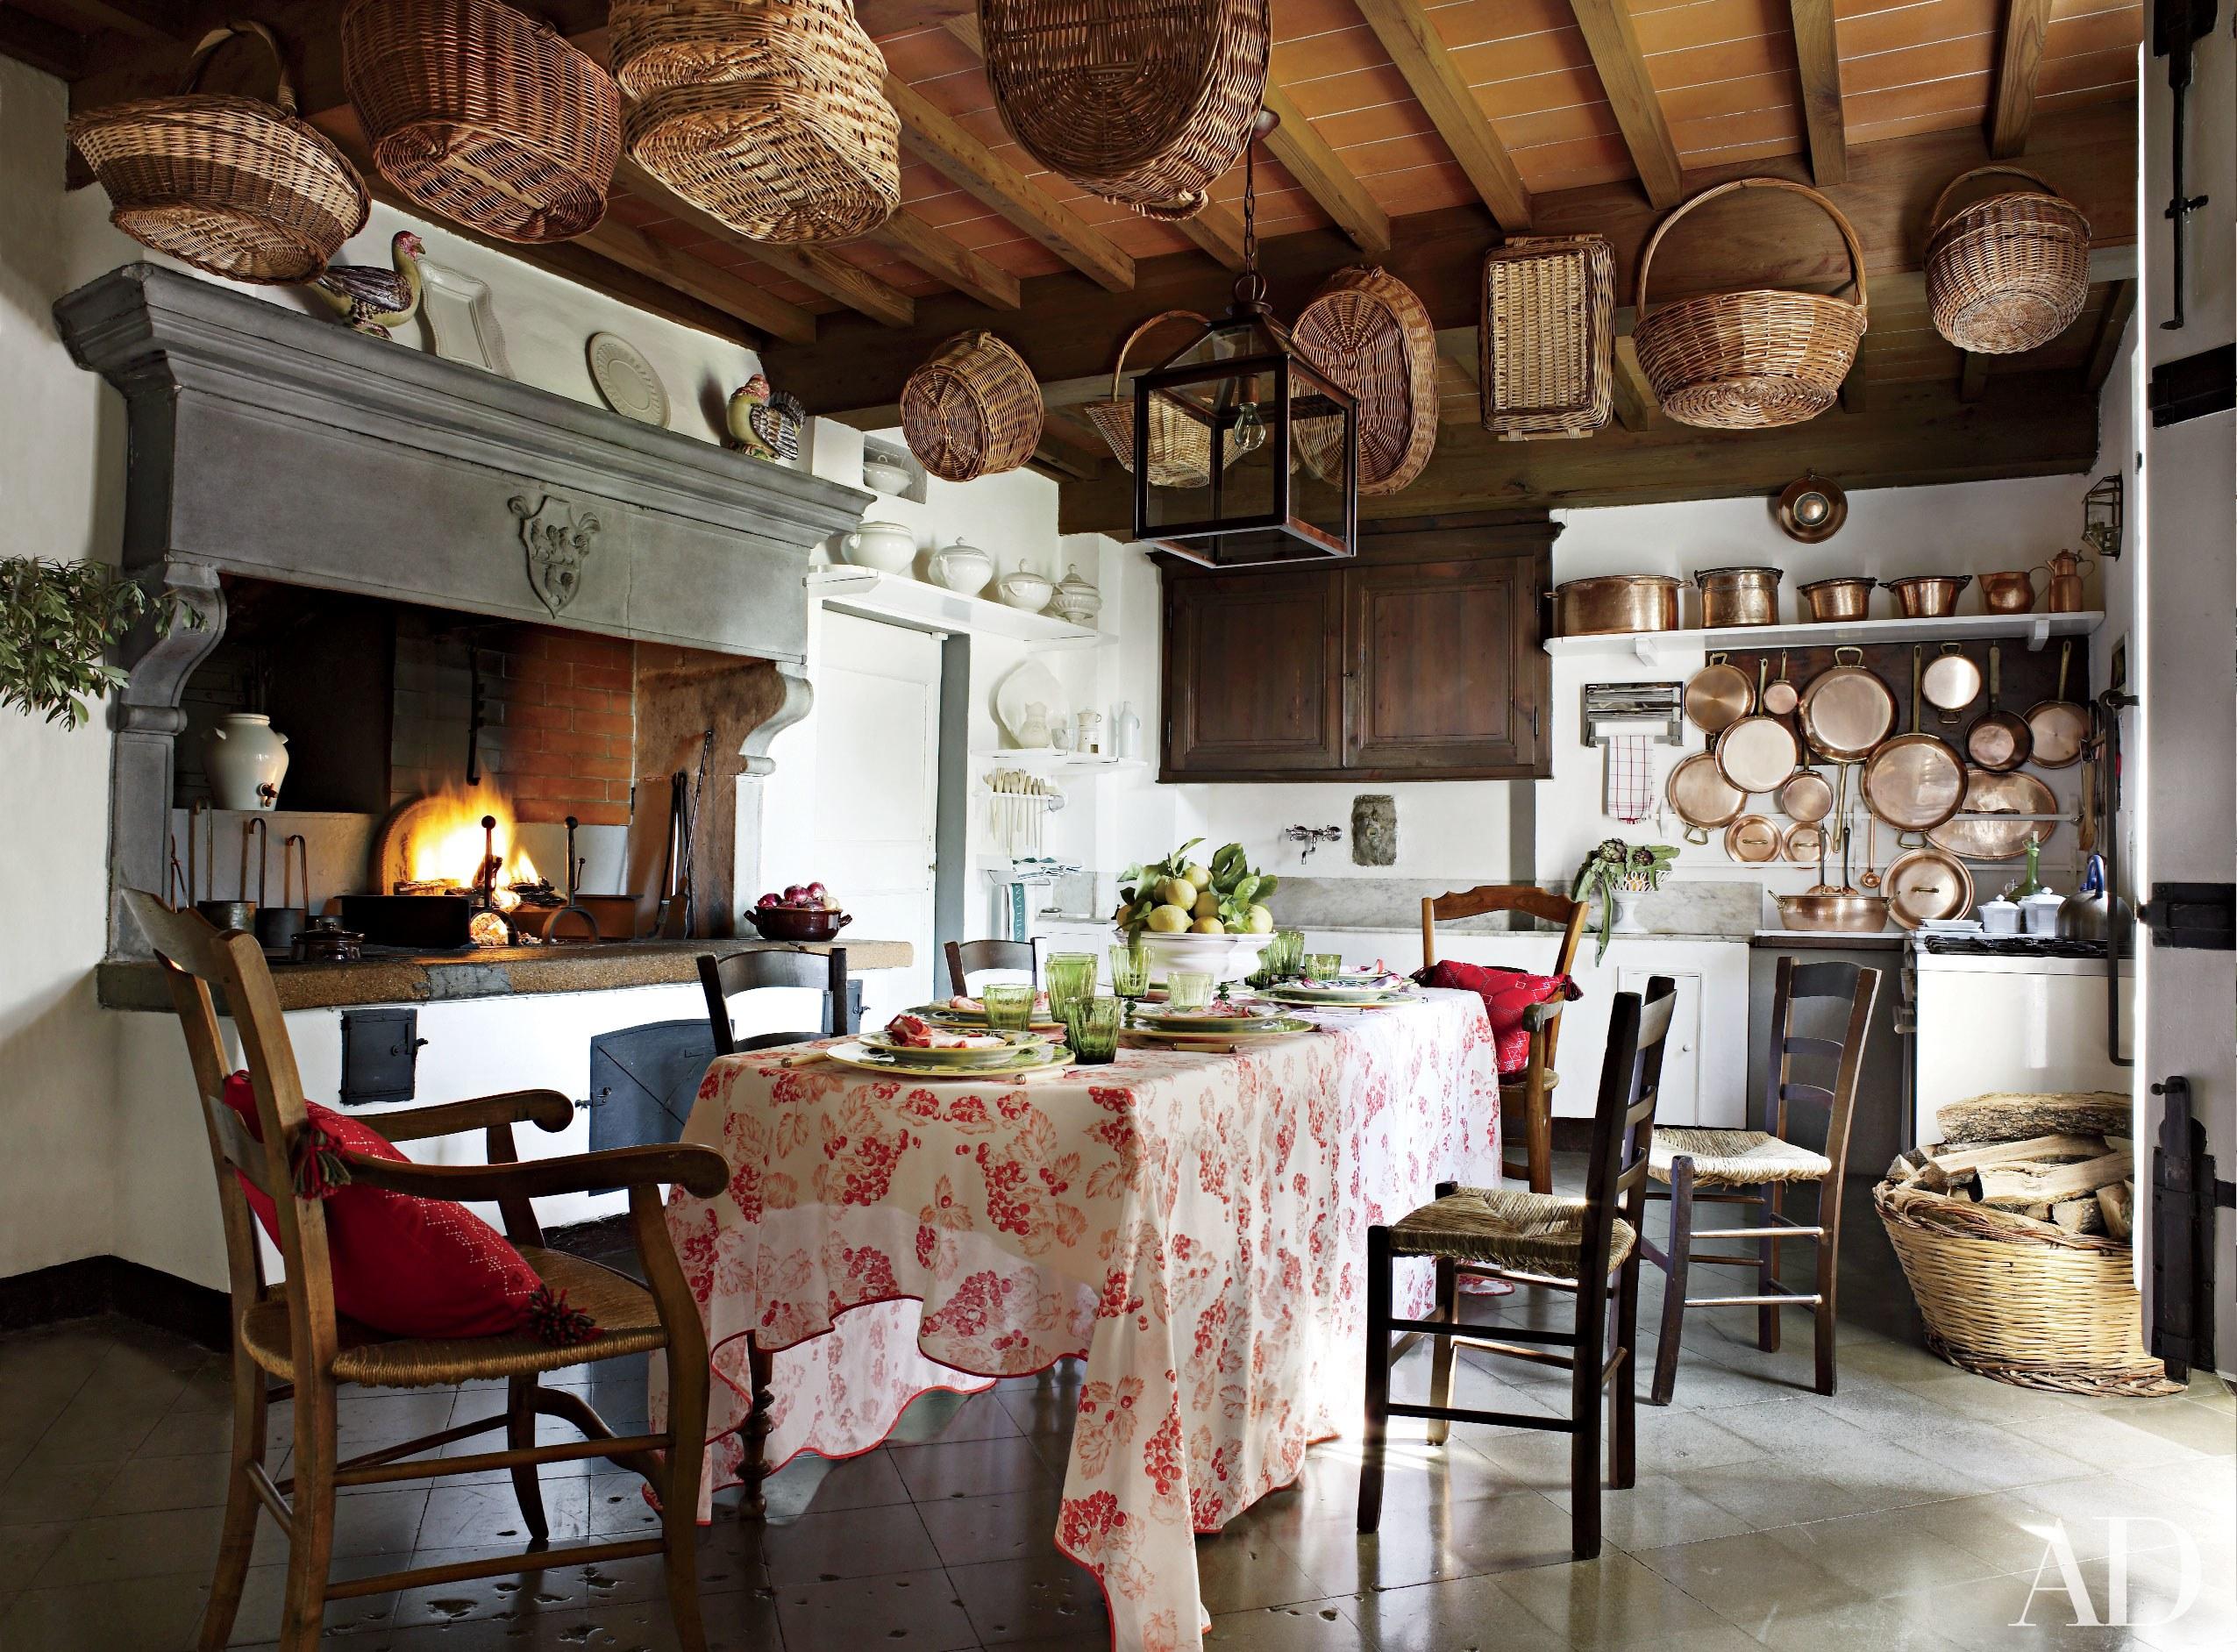 vychyt vky do kuchyn inspiri. Black Bedroom Furniture Sets. Home Design Ideas